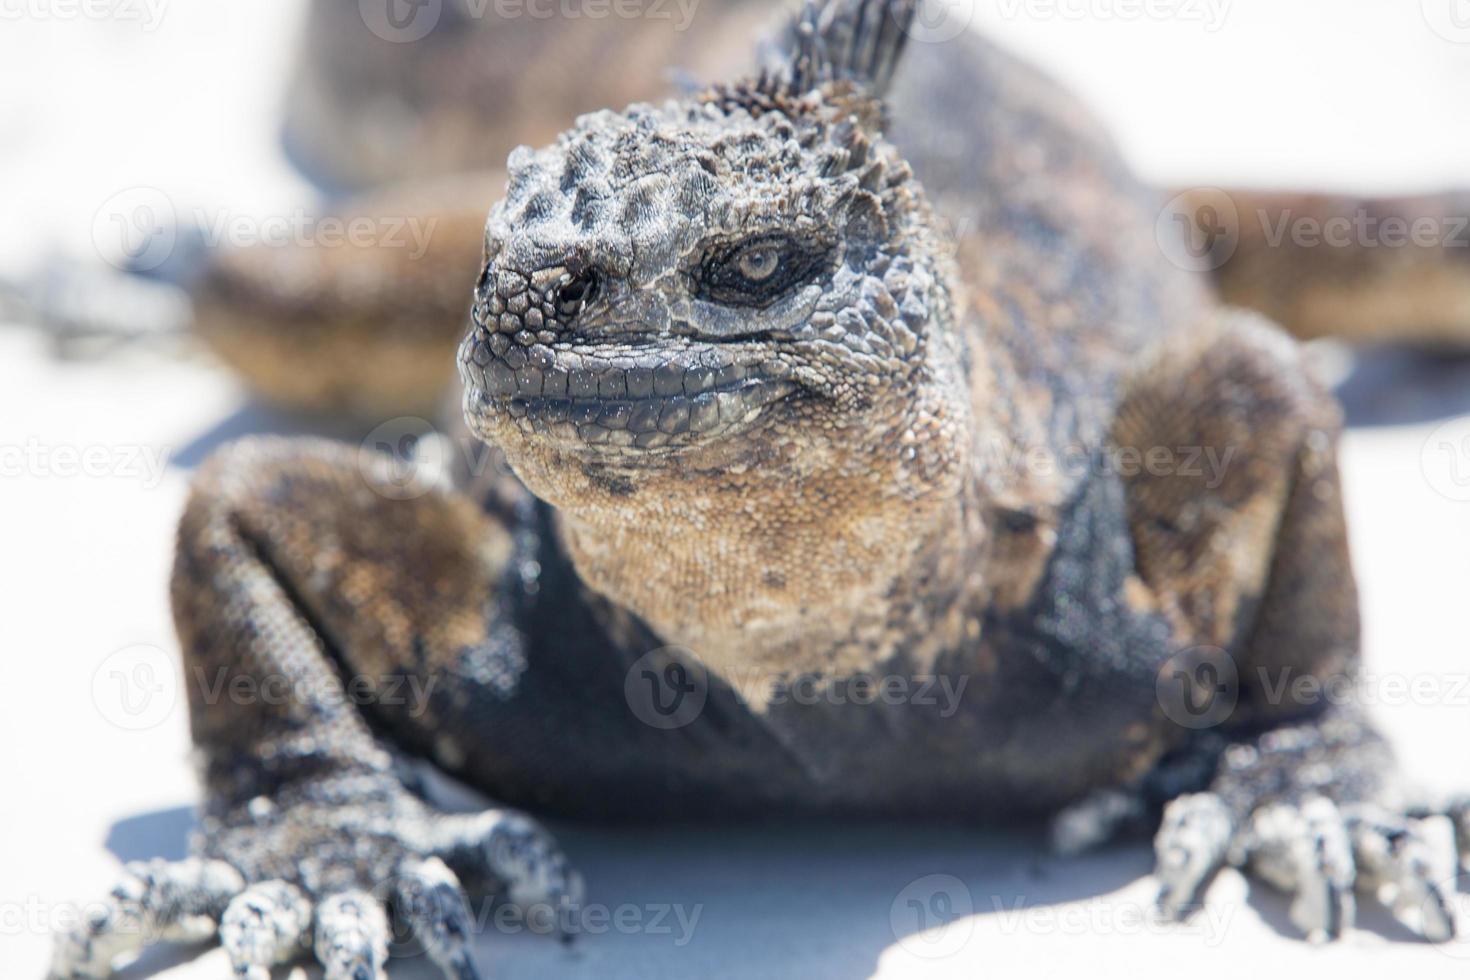 Marine iguana in the Galapagos islands photo